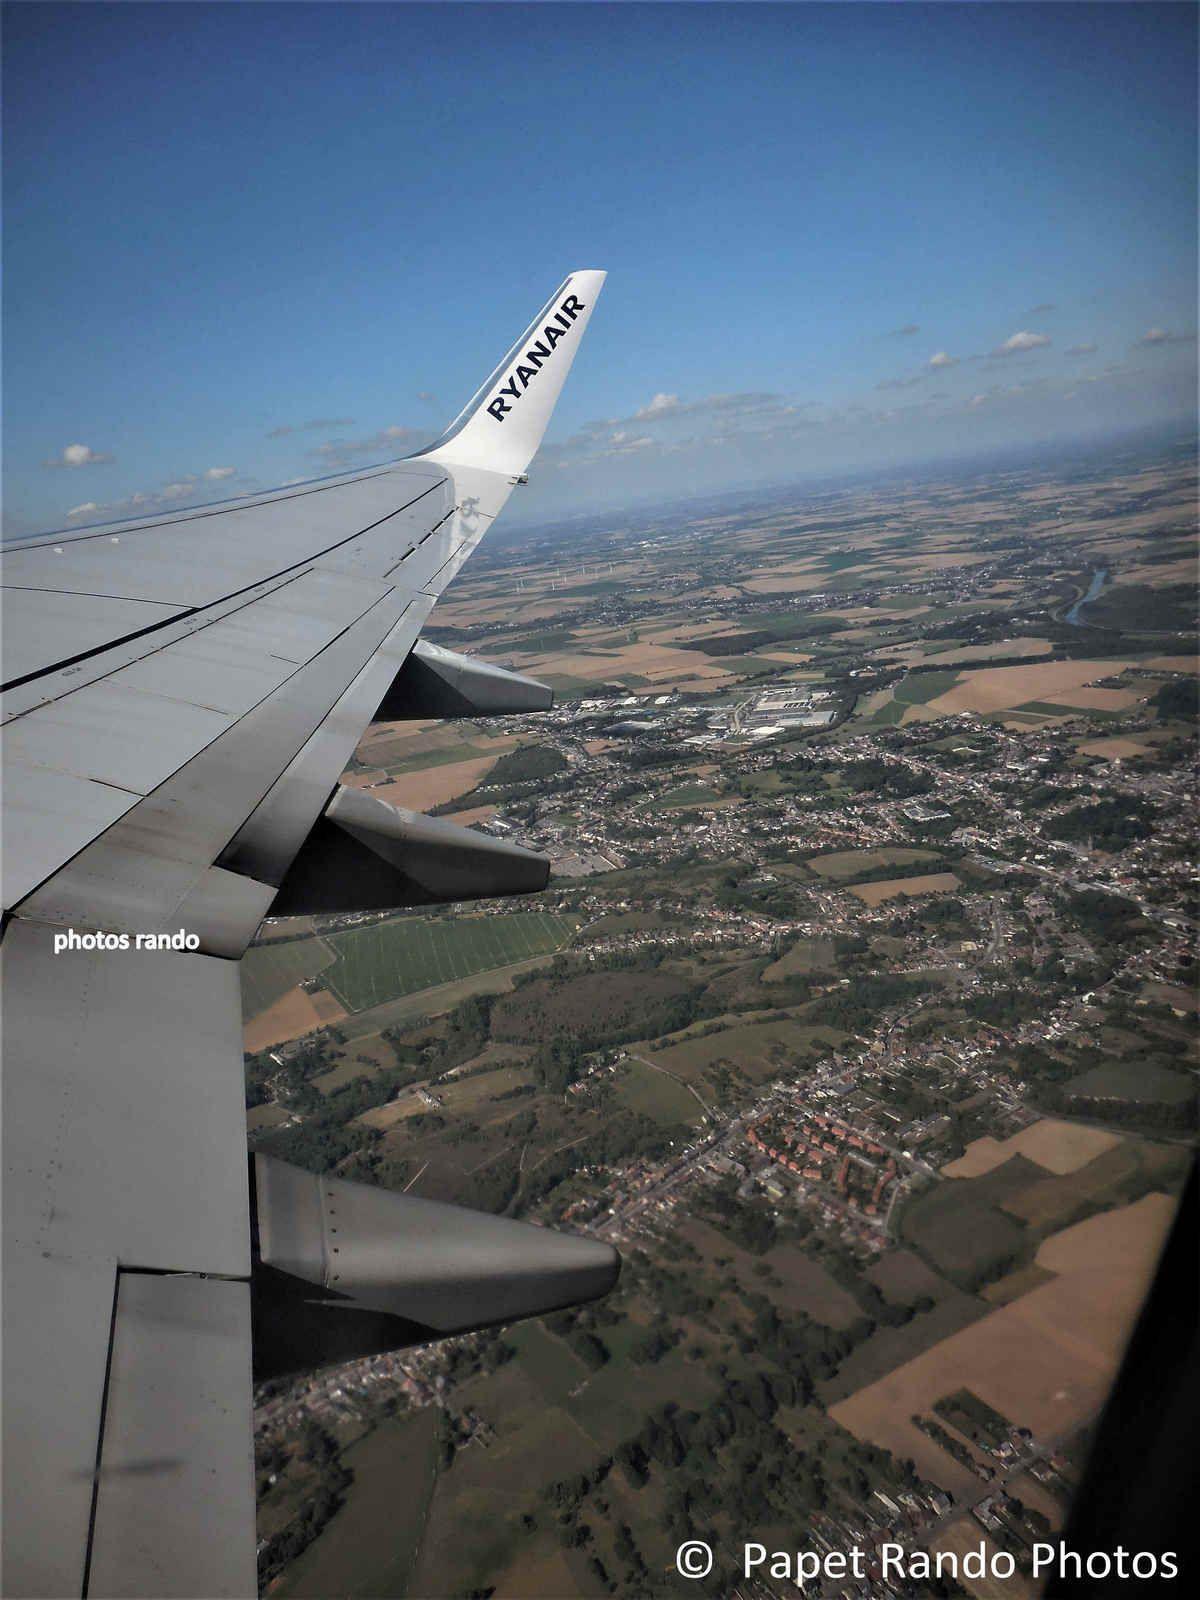 Mon coin vu du ciel, Heppignies ( mon village jusqu'a mes 20 ans ) , Ransart ( Raspes), Jumet, Luttre,  etc